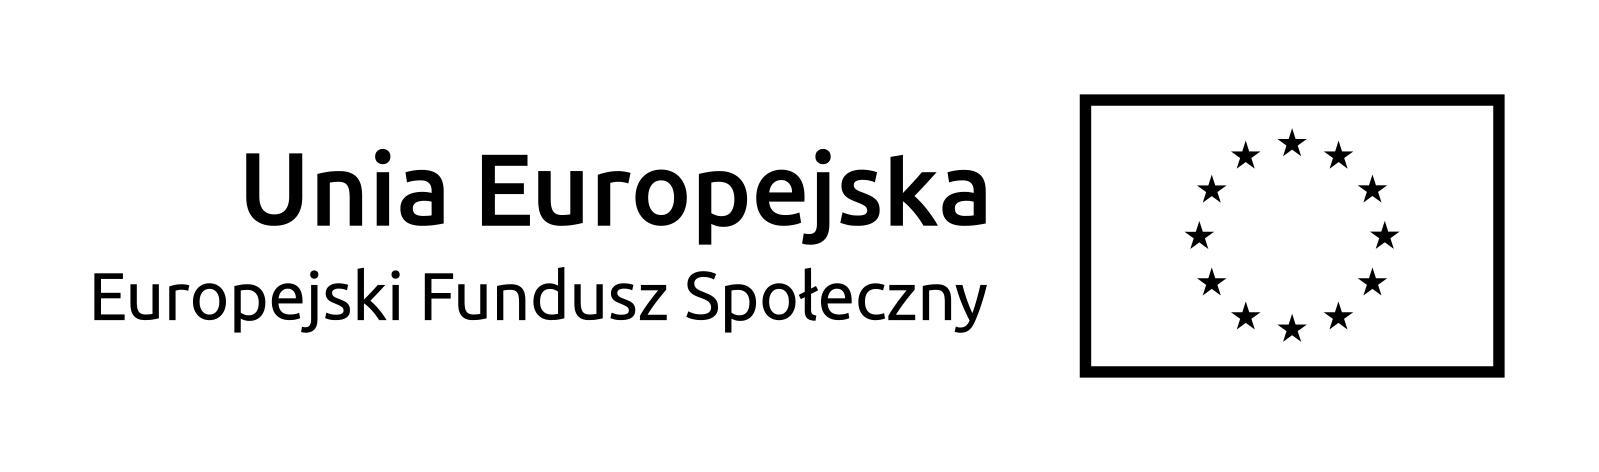 logo_EU_EFS-czb.jpg (139 KB)